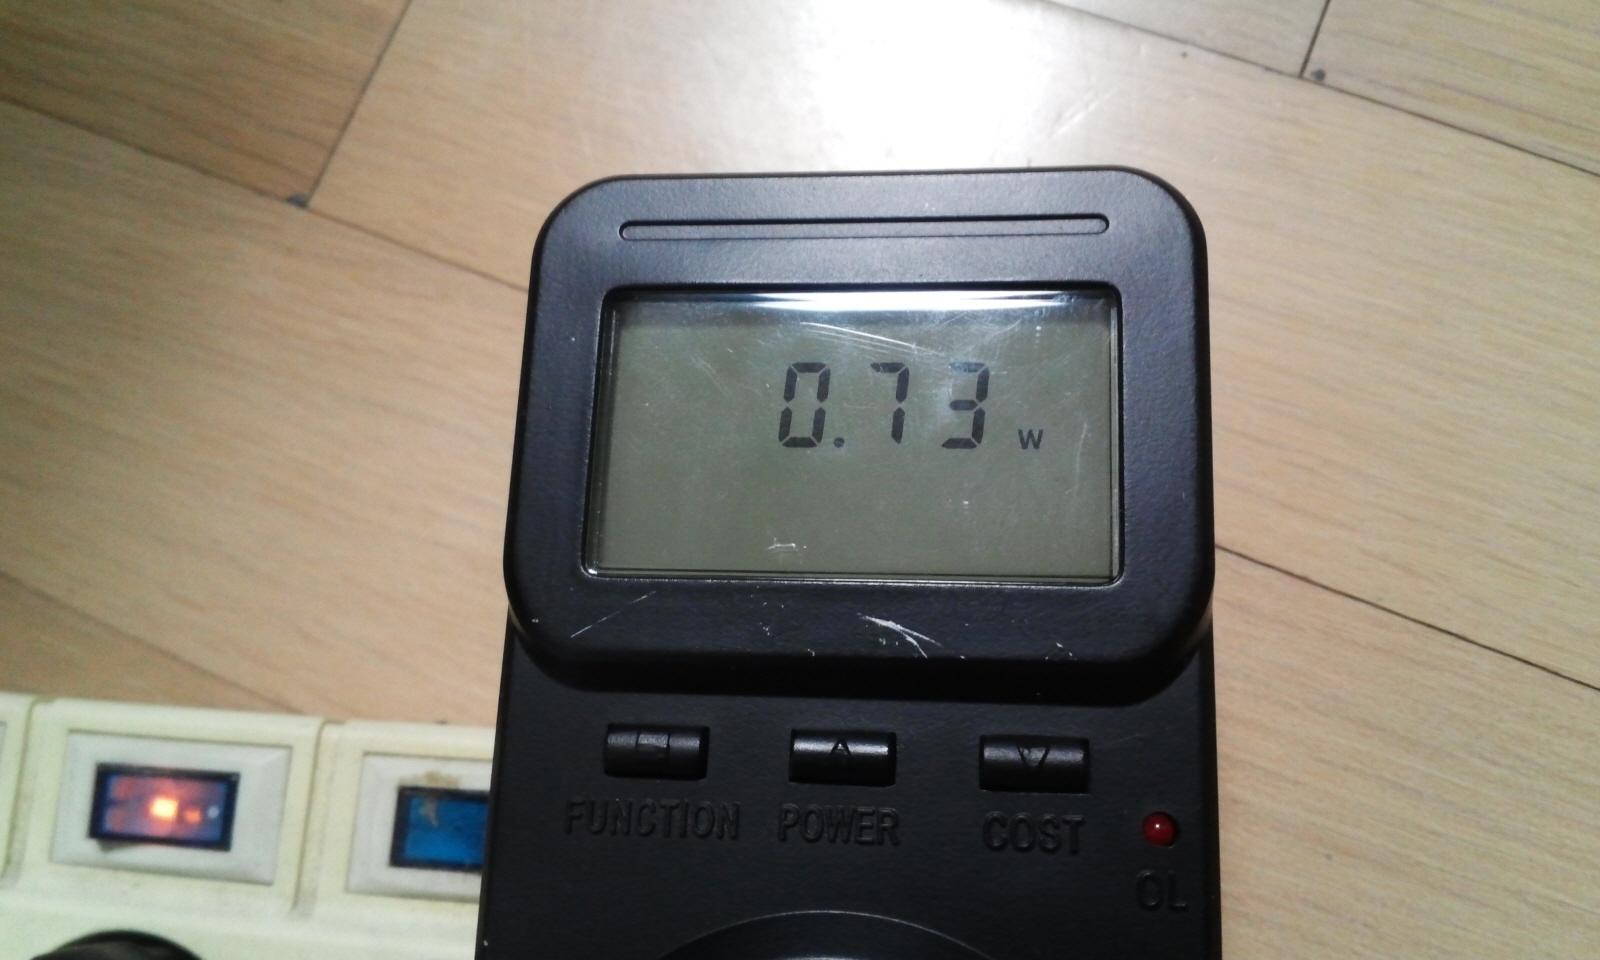 IMG_20131017_193611.jpg